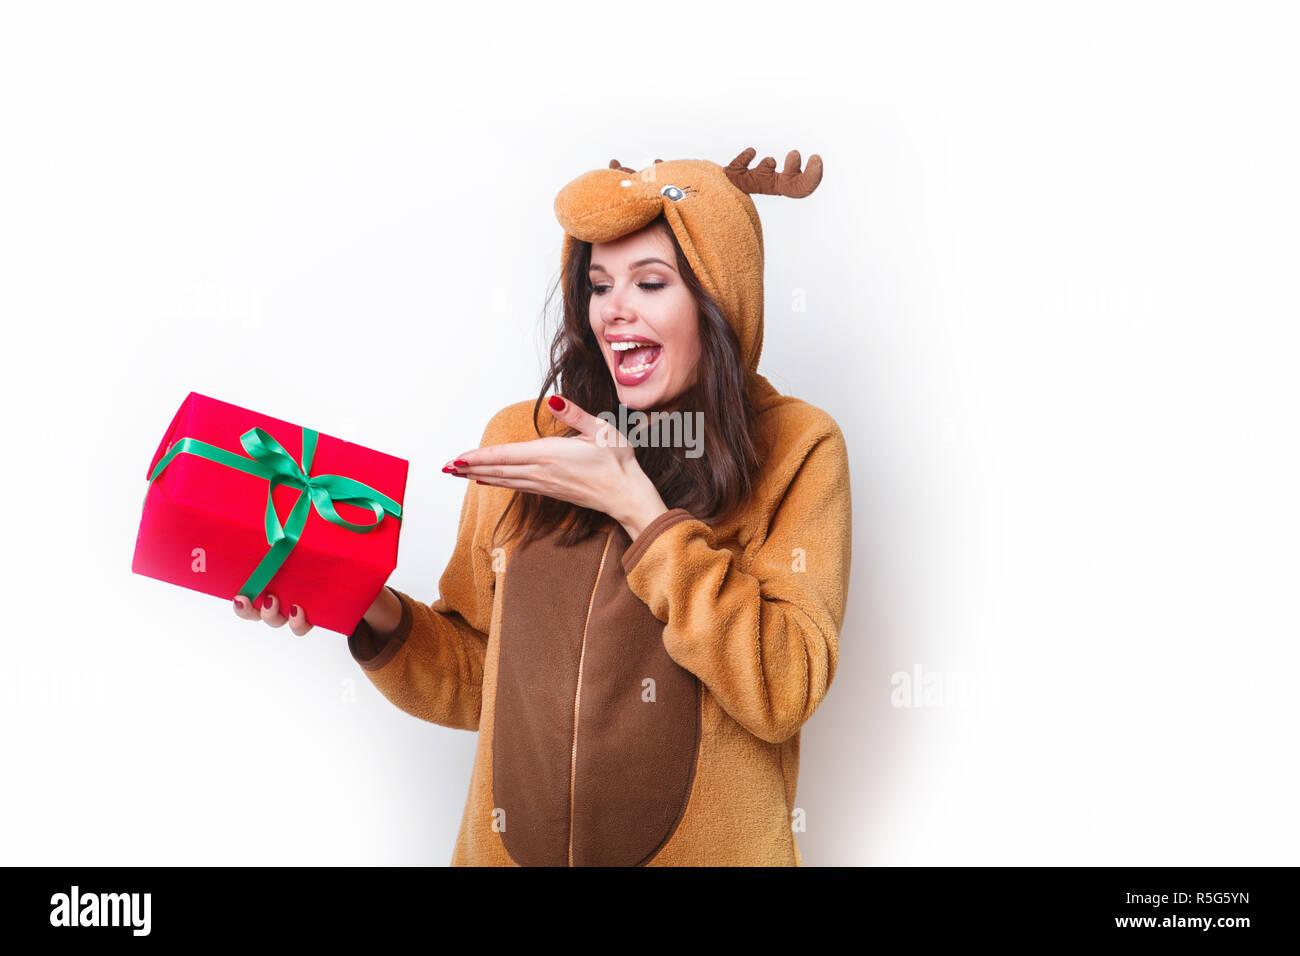 Kigurumi pajamas deer. Cute young woman in pajamas with christmas present box on white background . - Stock Image